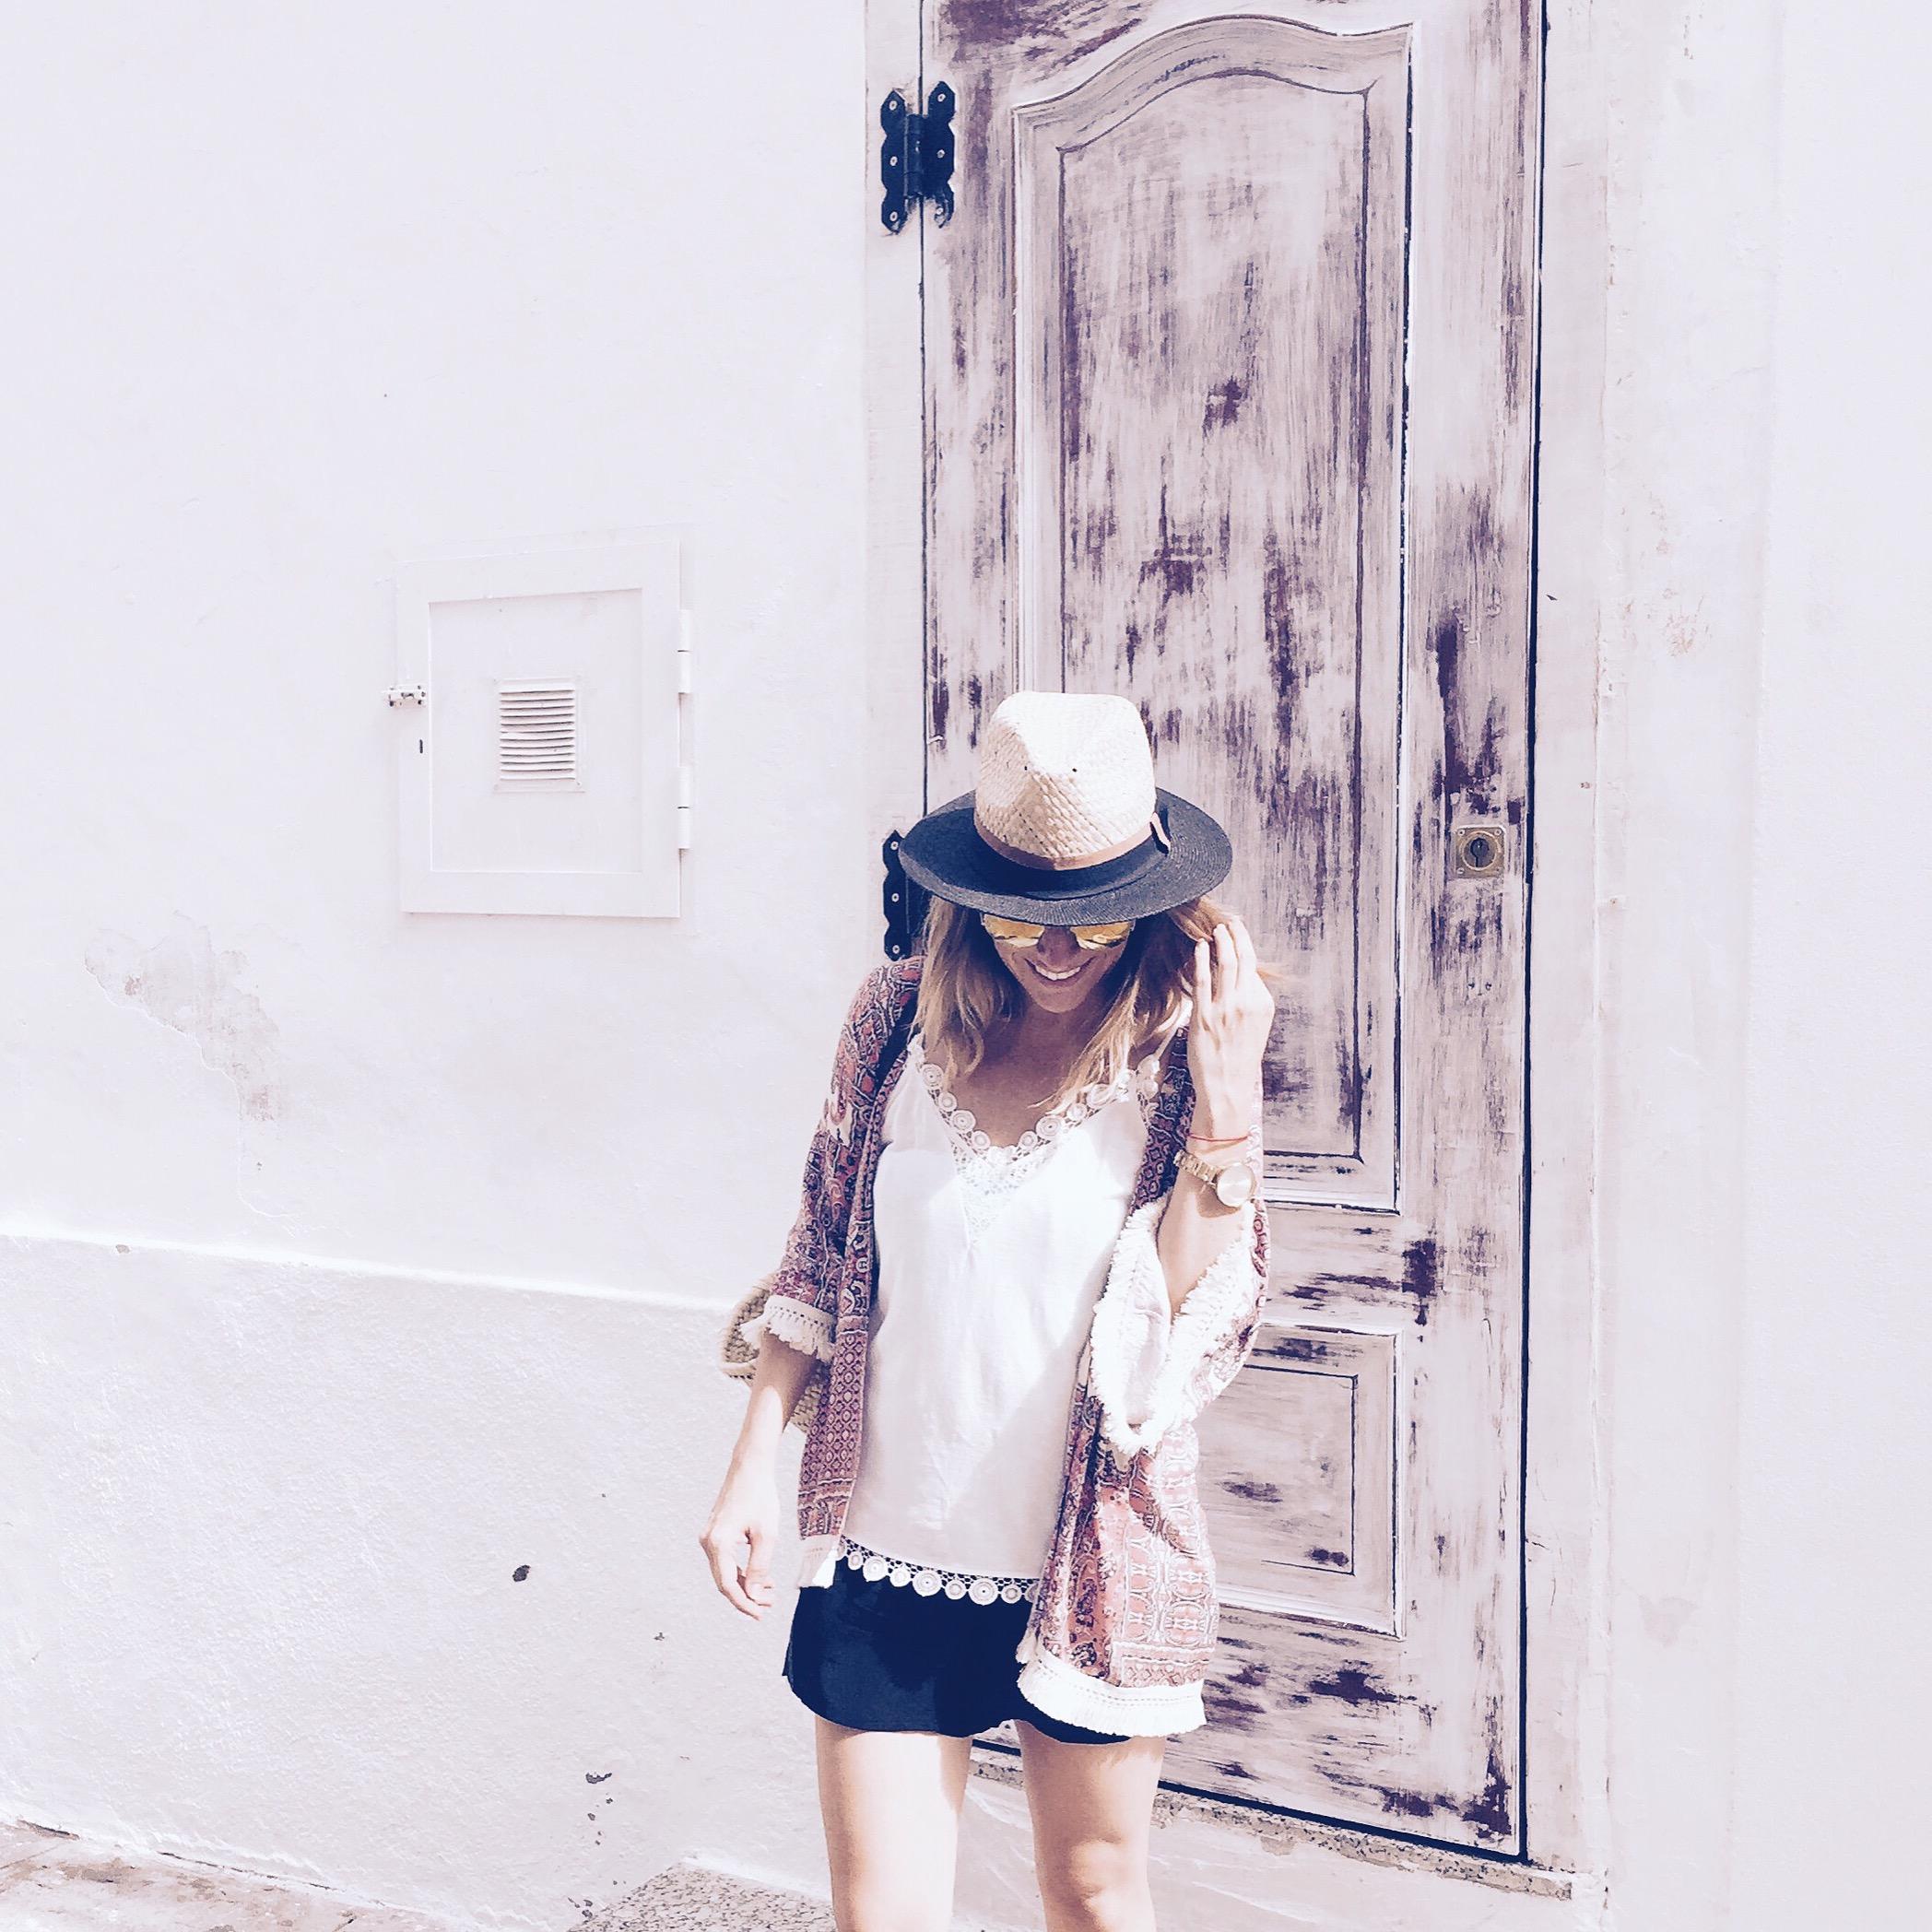 estilo-boho-chic-ibiza-blogger-monica-sors